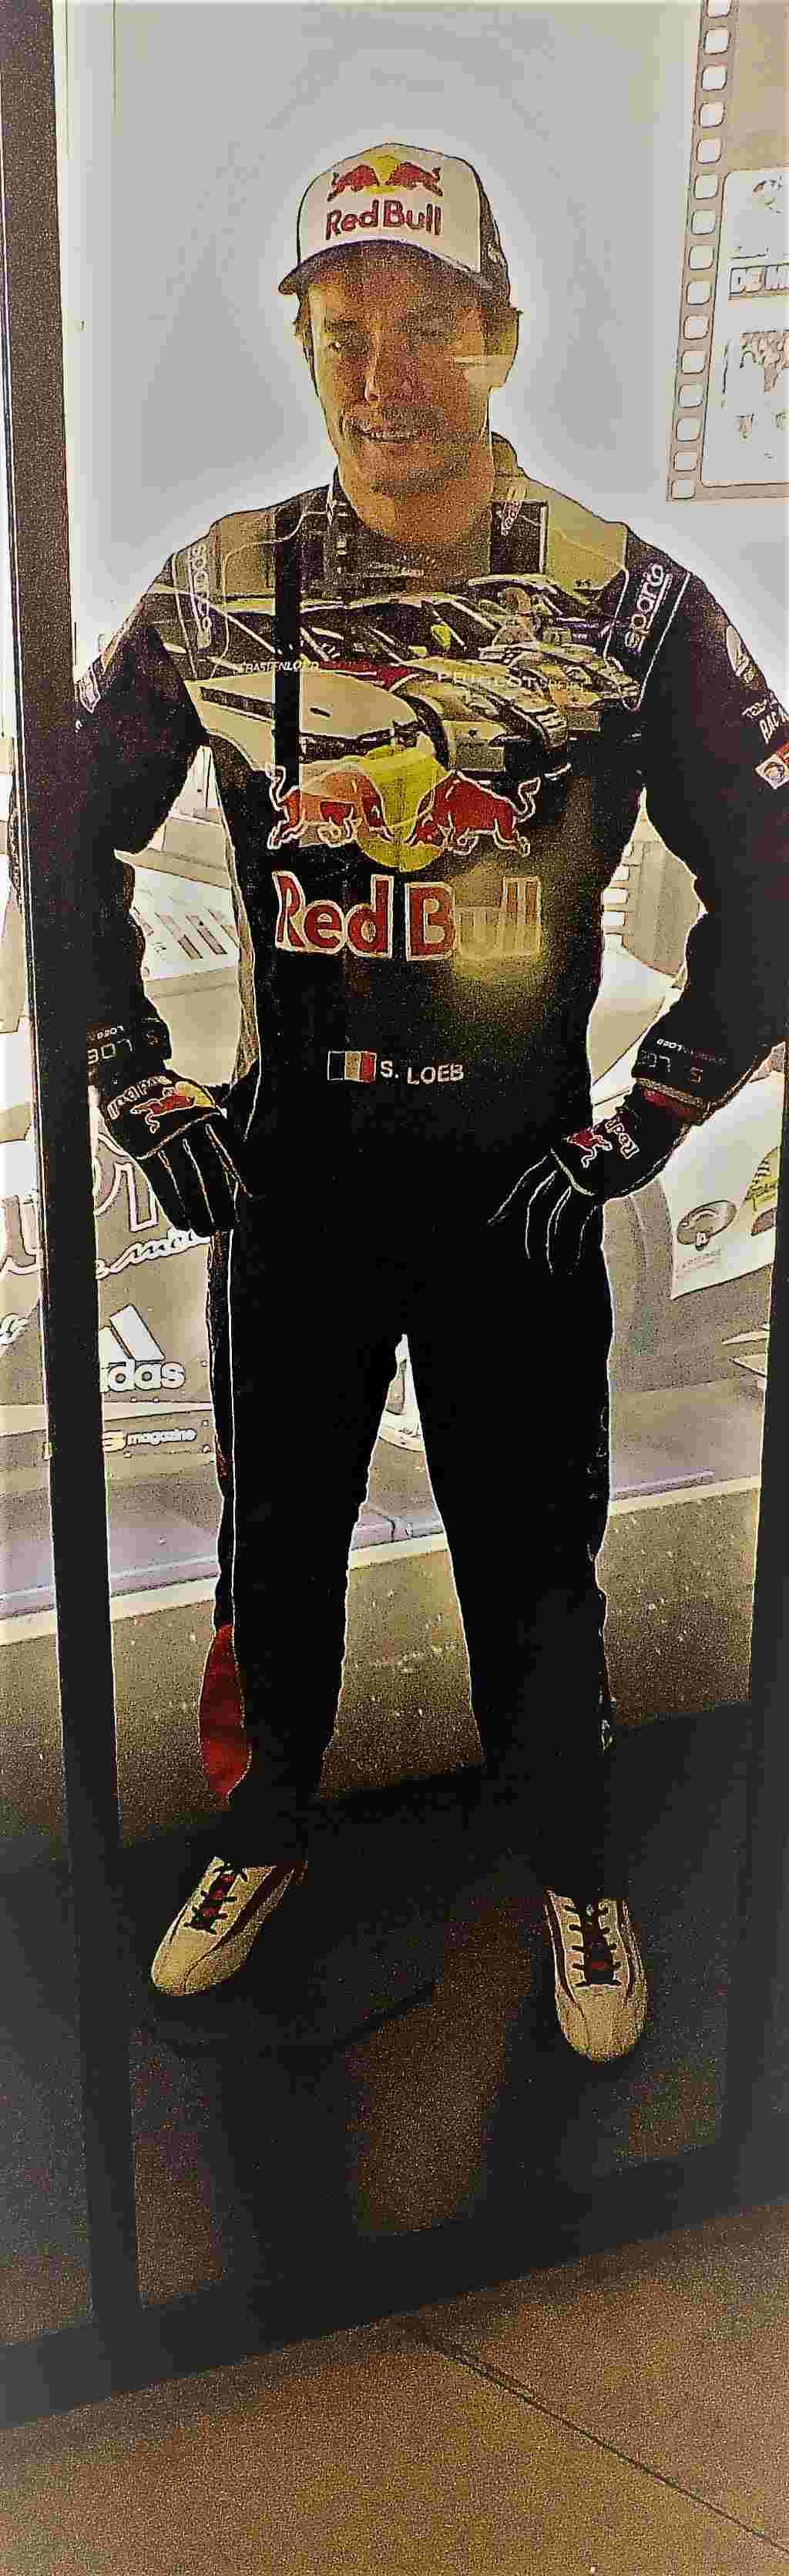 Sébastien Loeb Racing Xperience (pavillon 360°) · avril 2018 - Page 10 Dscf0716